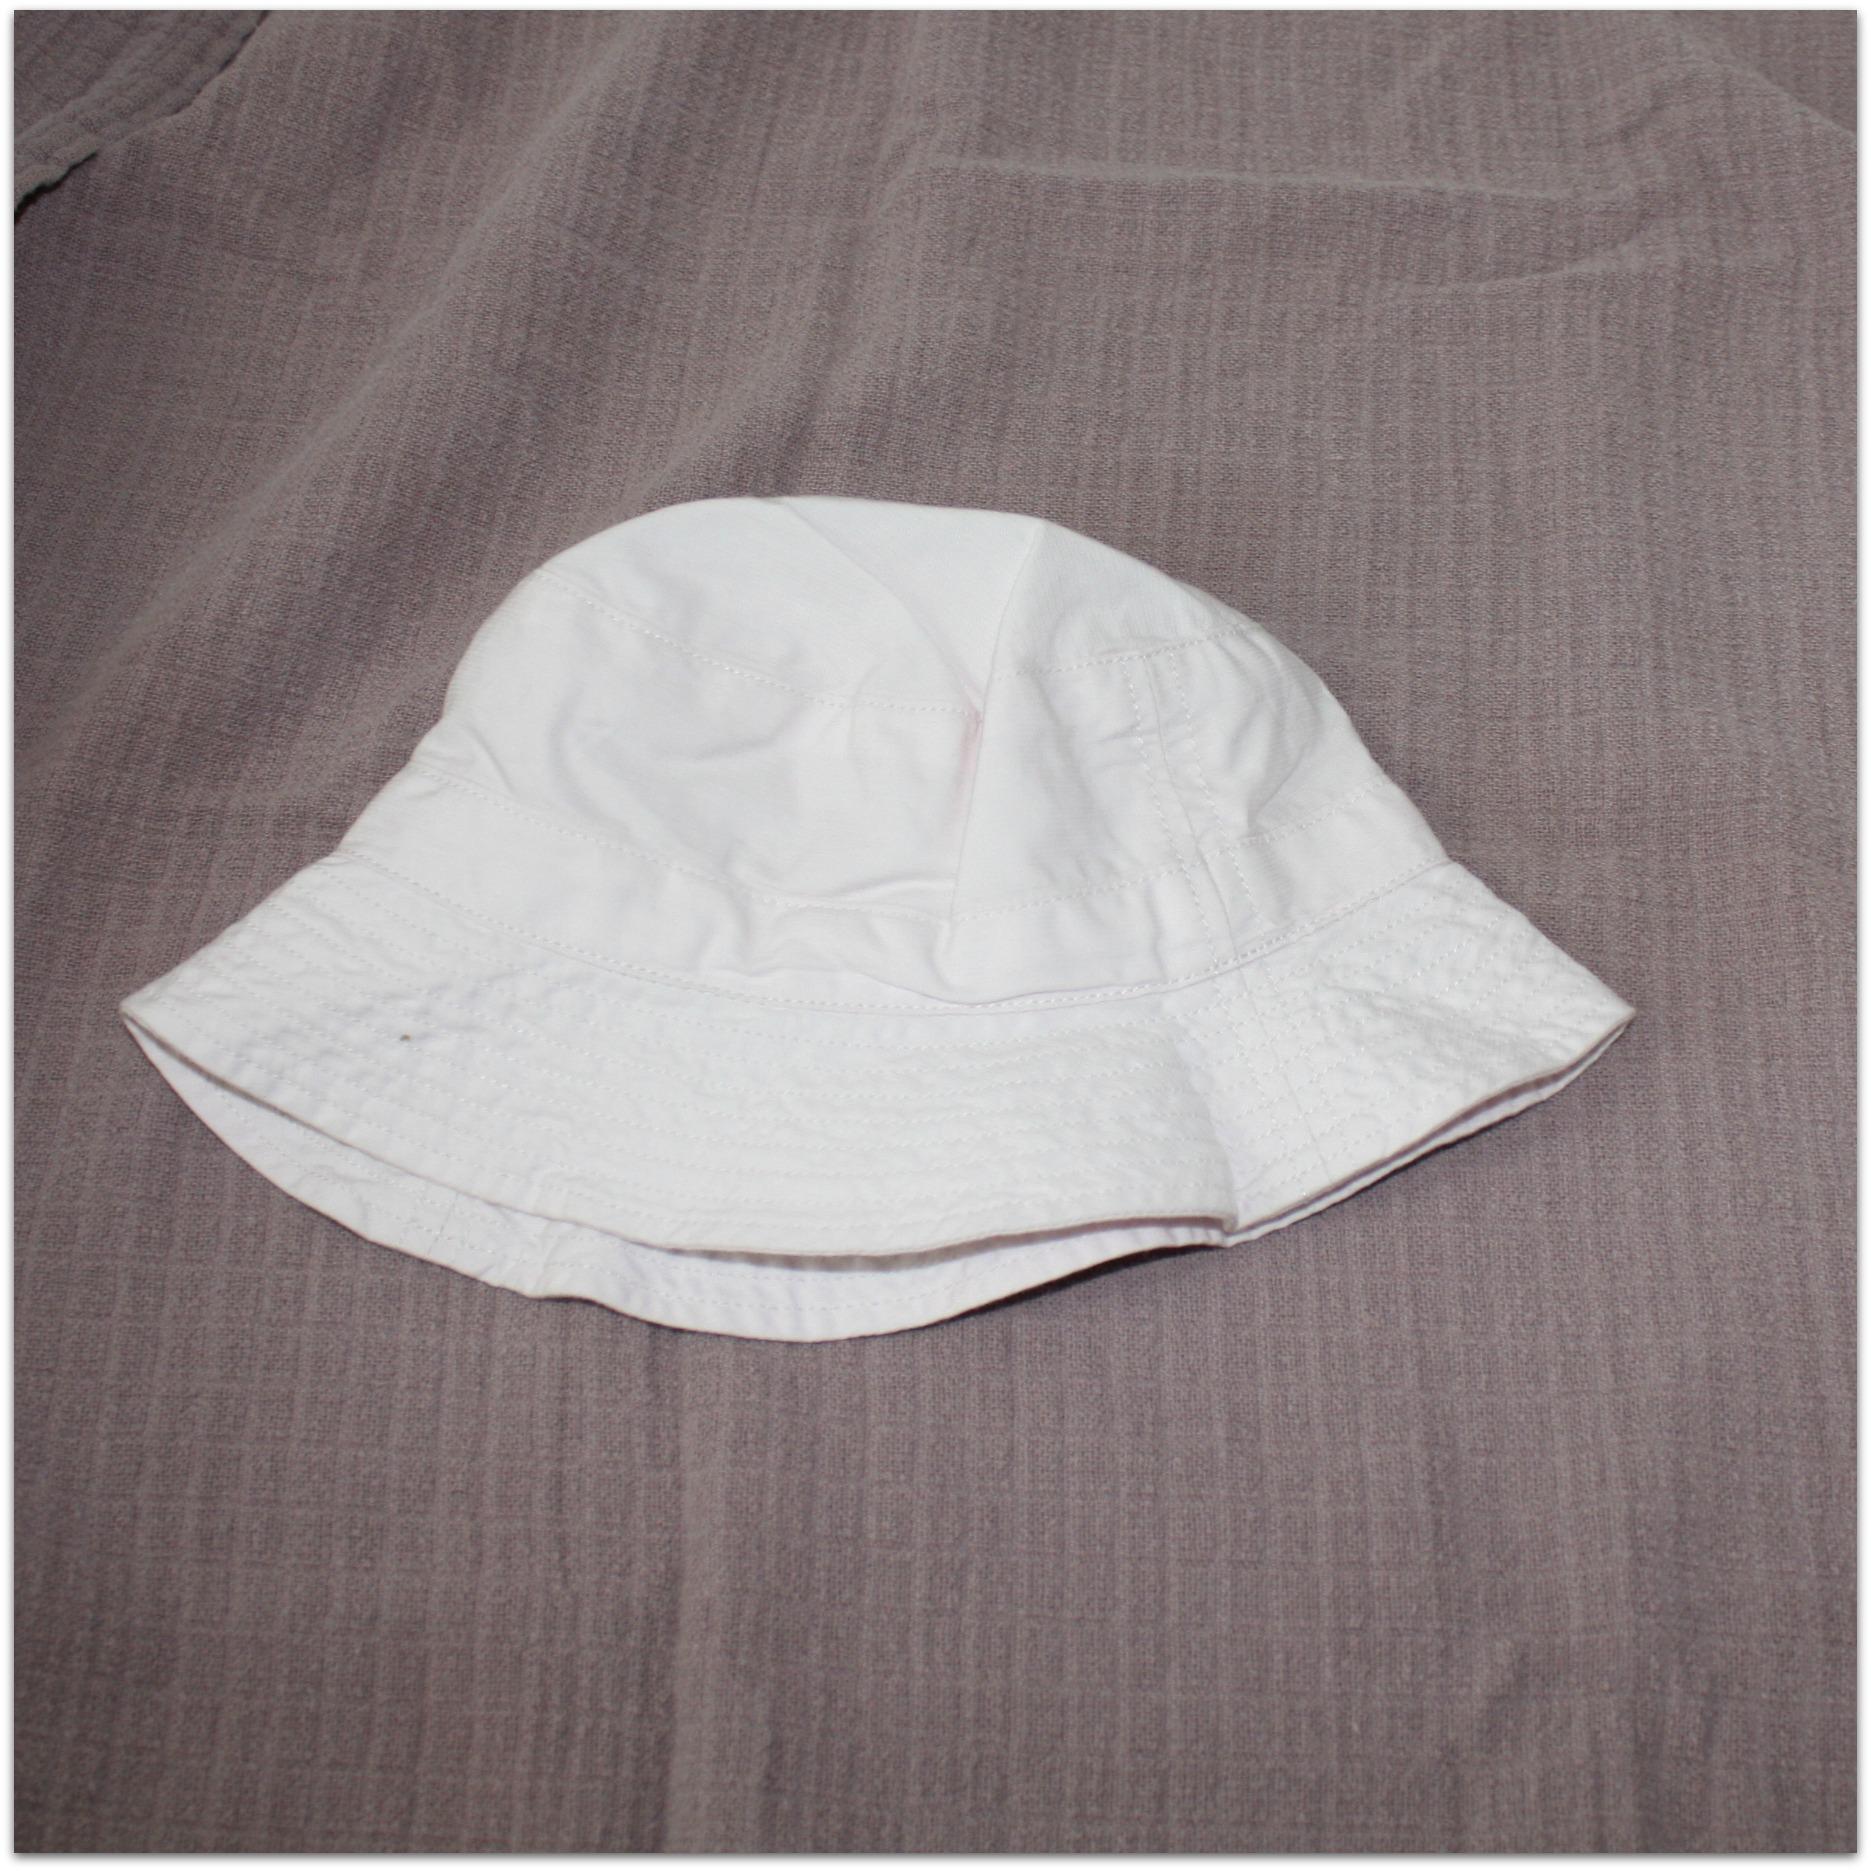 Chapeau PB - 3 mois